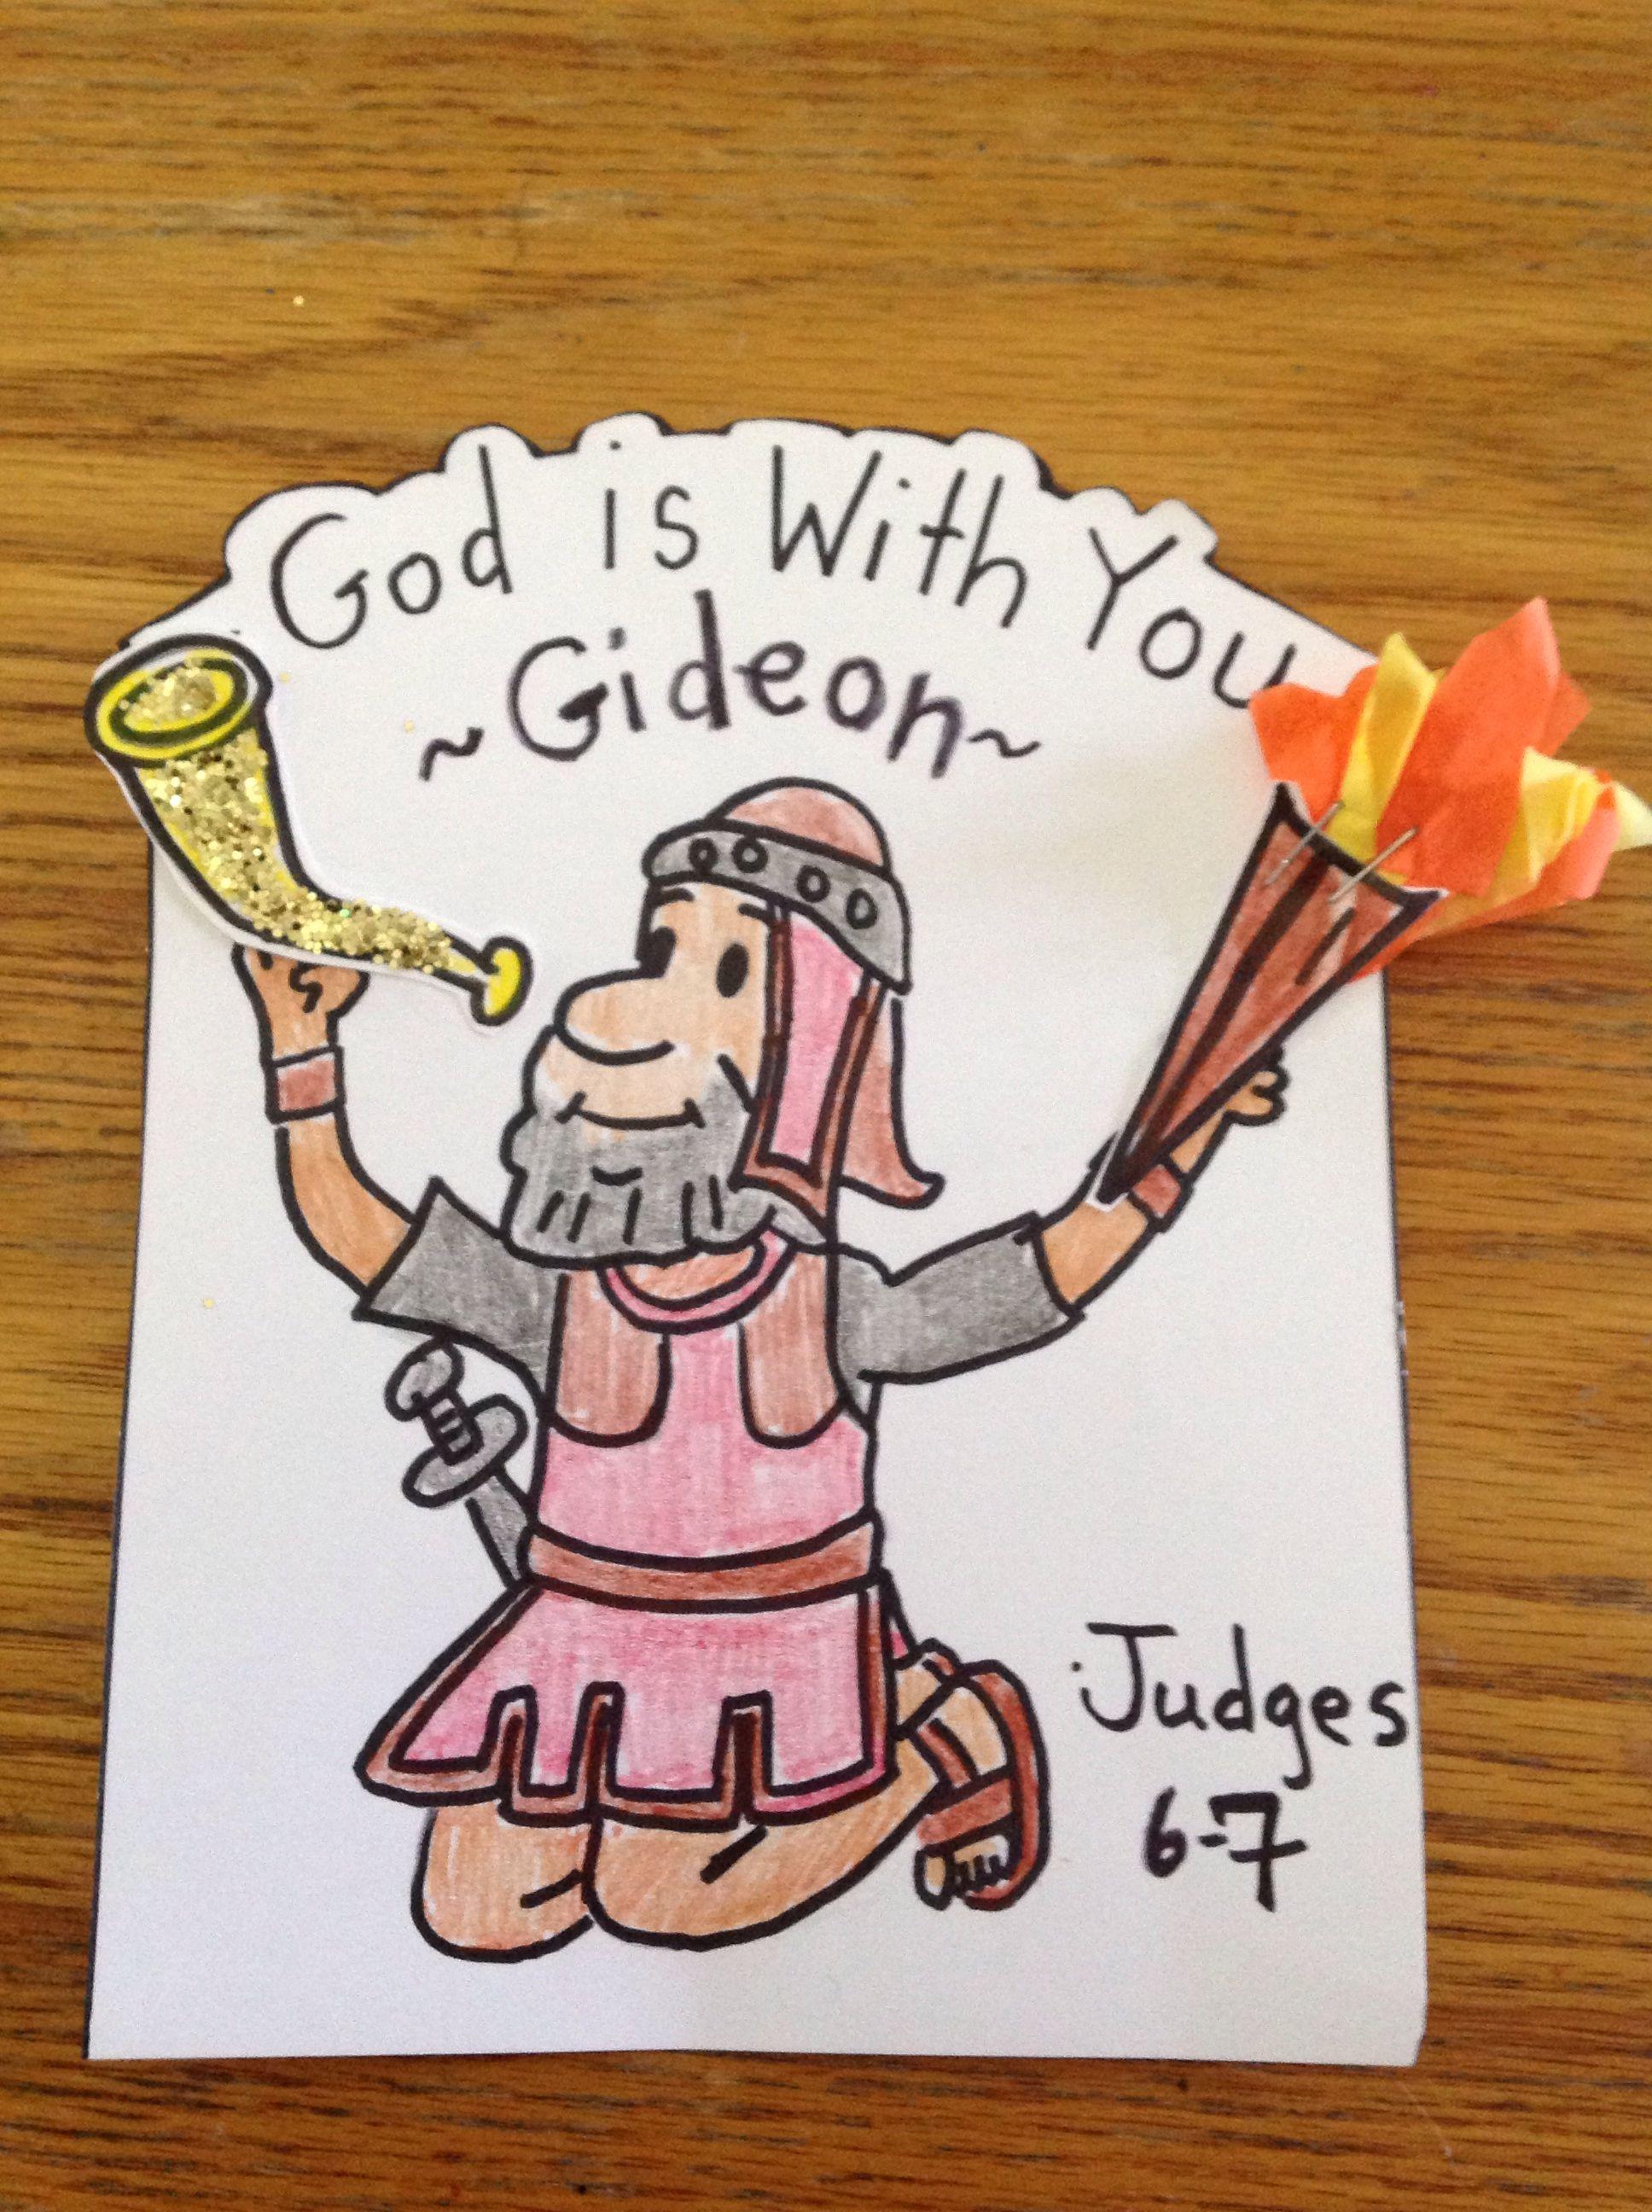 Gideon - Women's Bible Study - 21 MAR 2019 - evensi.us